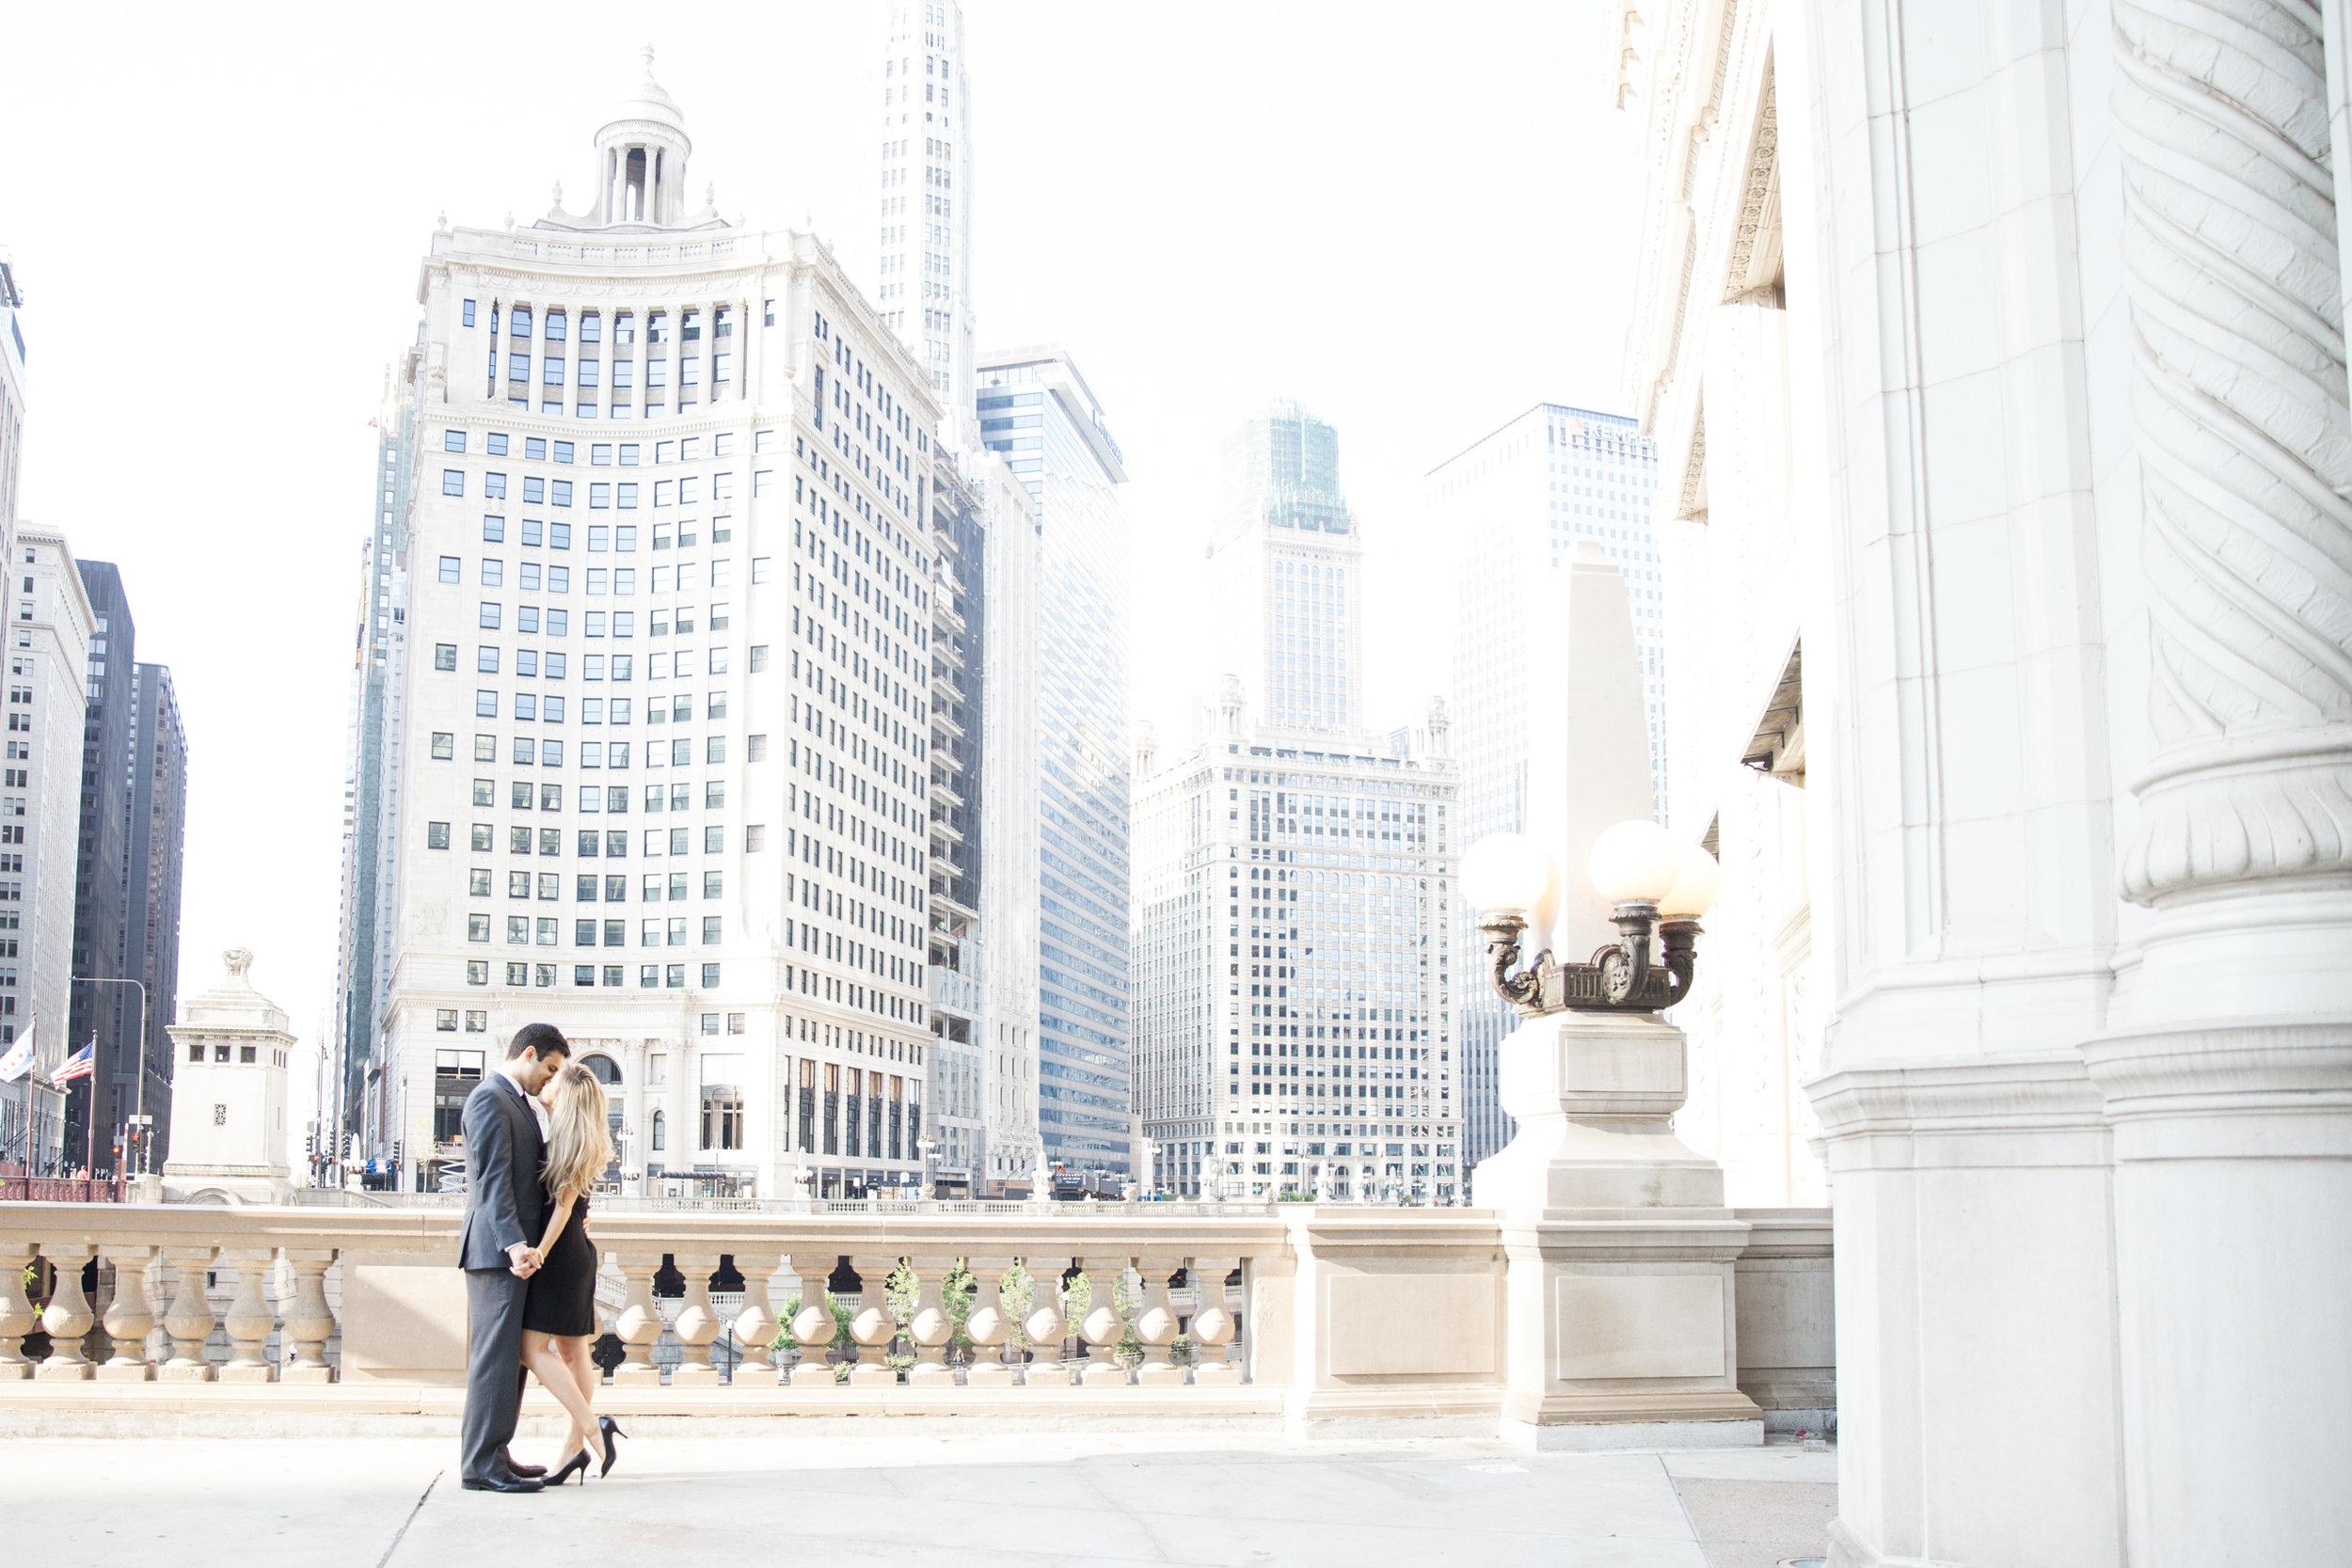 LisaDiederichPhotography_Landon&Ramsey_ChicagoEngagement-6.jpg